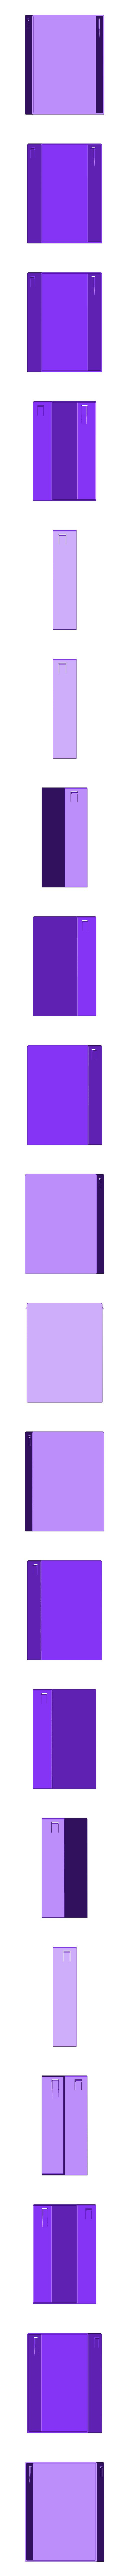 Drawer_31x95_D0.STL Download STL file Ender 3 Pro Storage Mod Kit • Object to 3D print, a3rdDimension